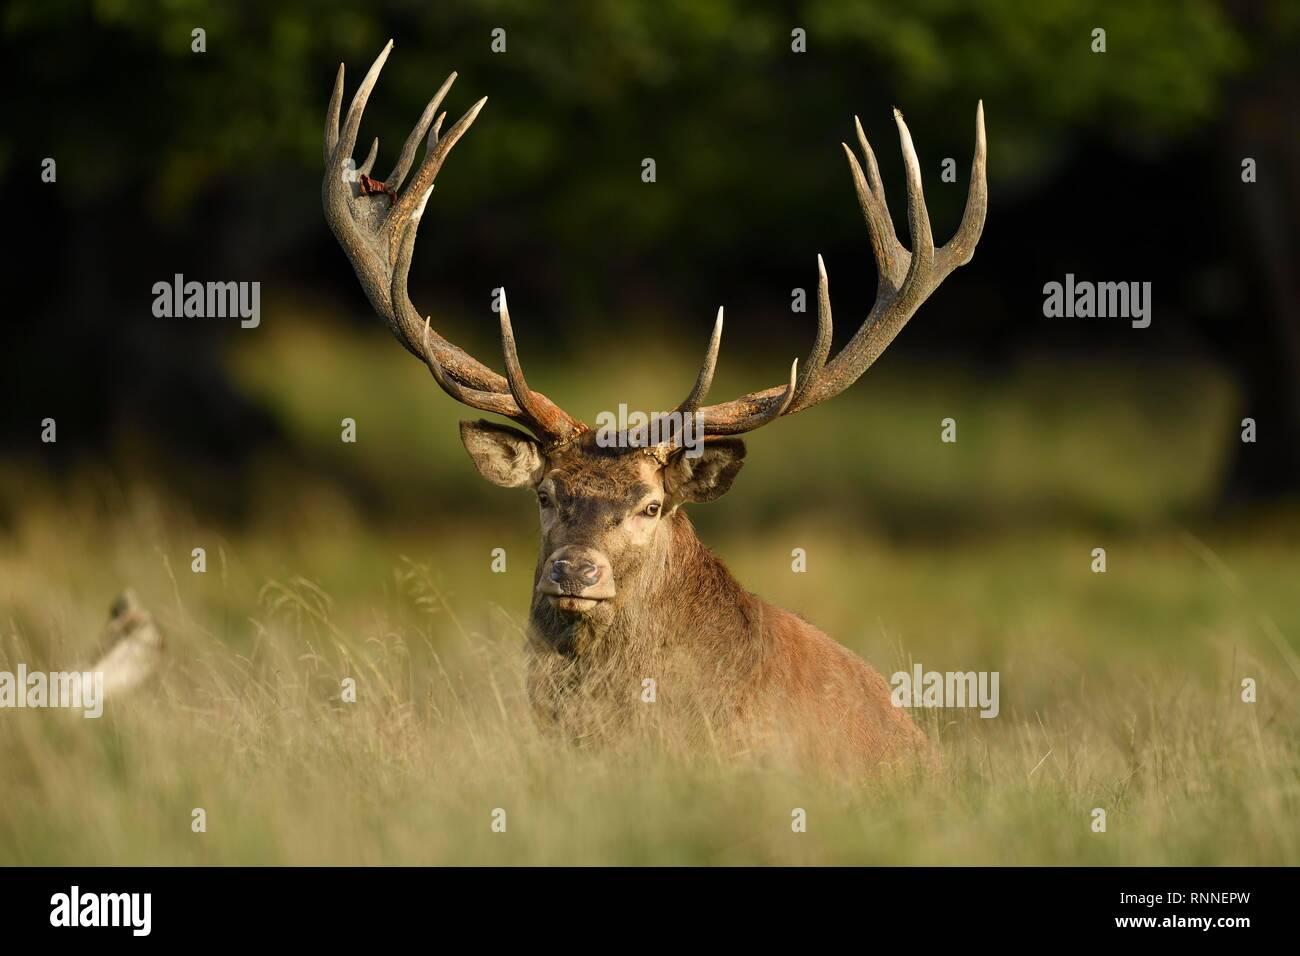 Capitalist red deer (Cervus elaphus), sits in a meadow, Jägersborg, Denmark - Stock Image